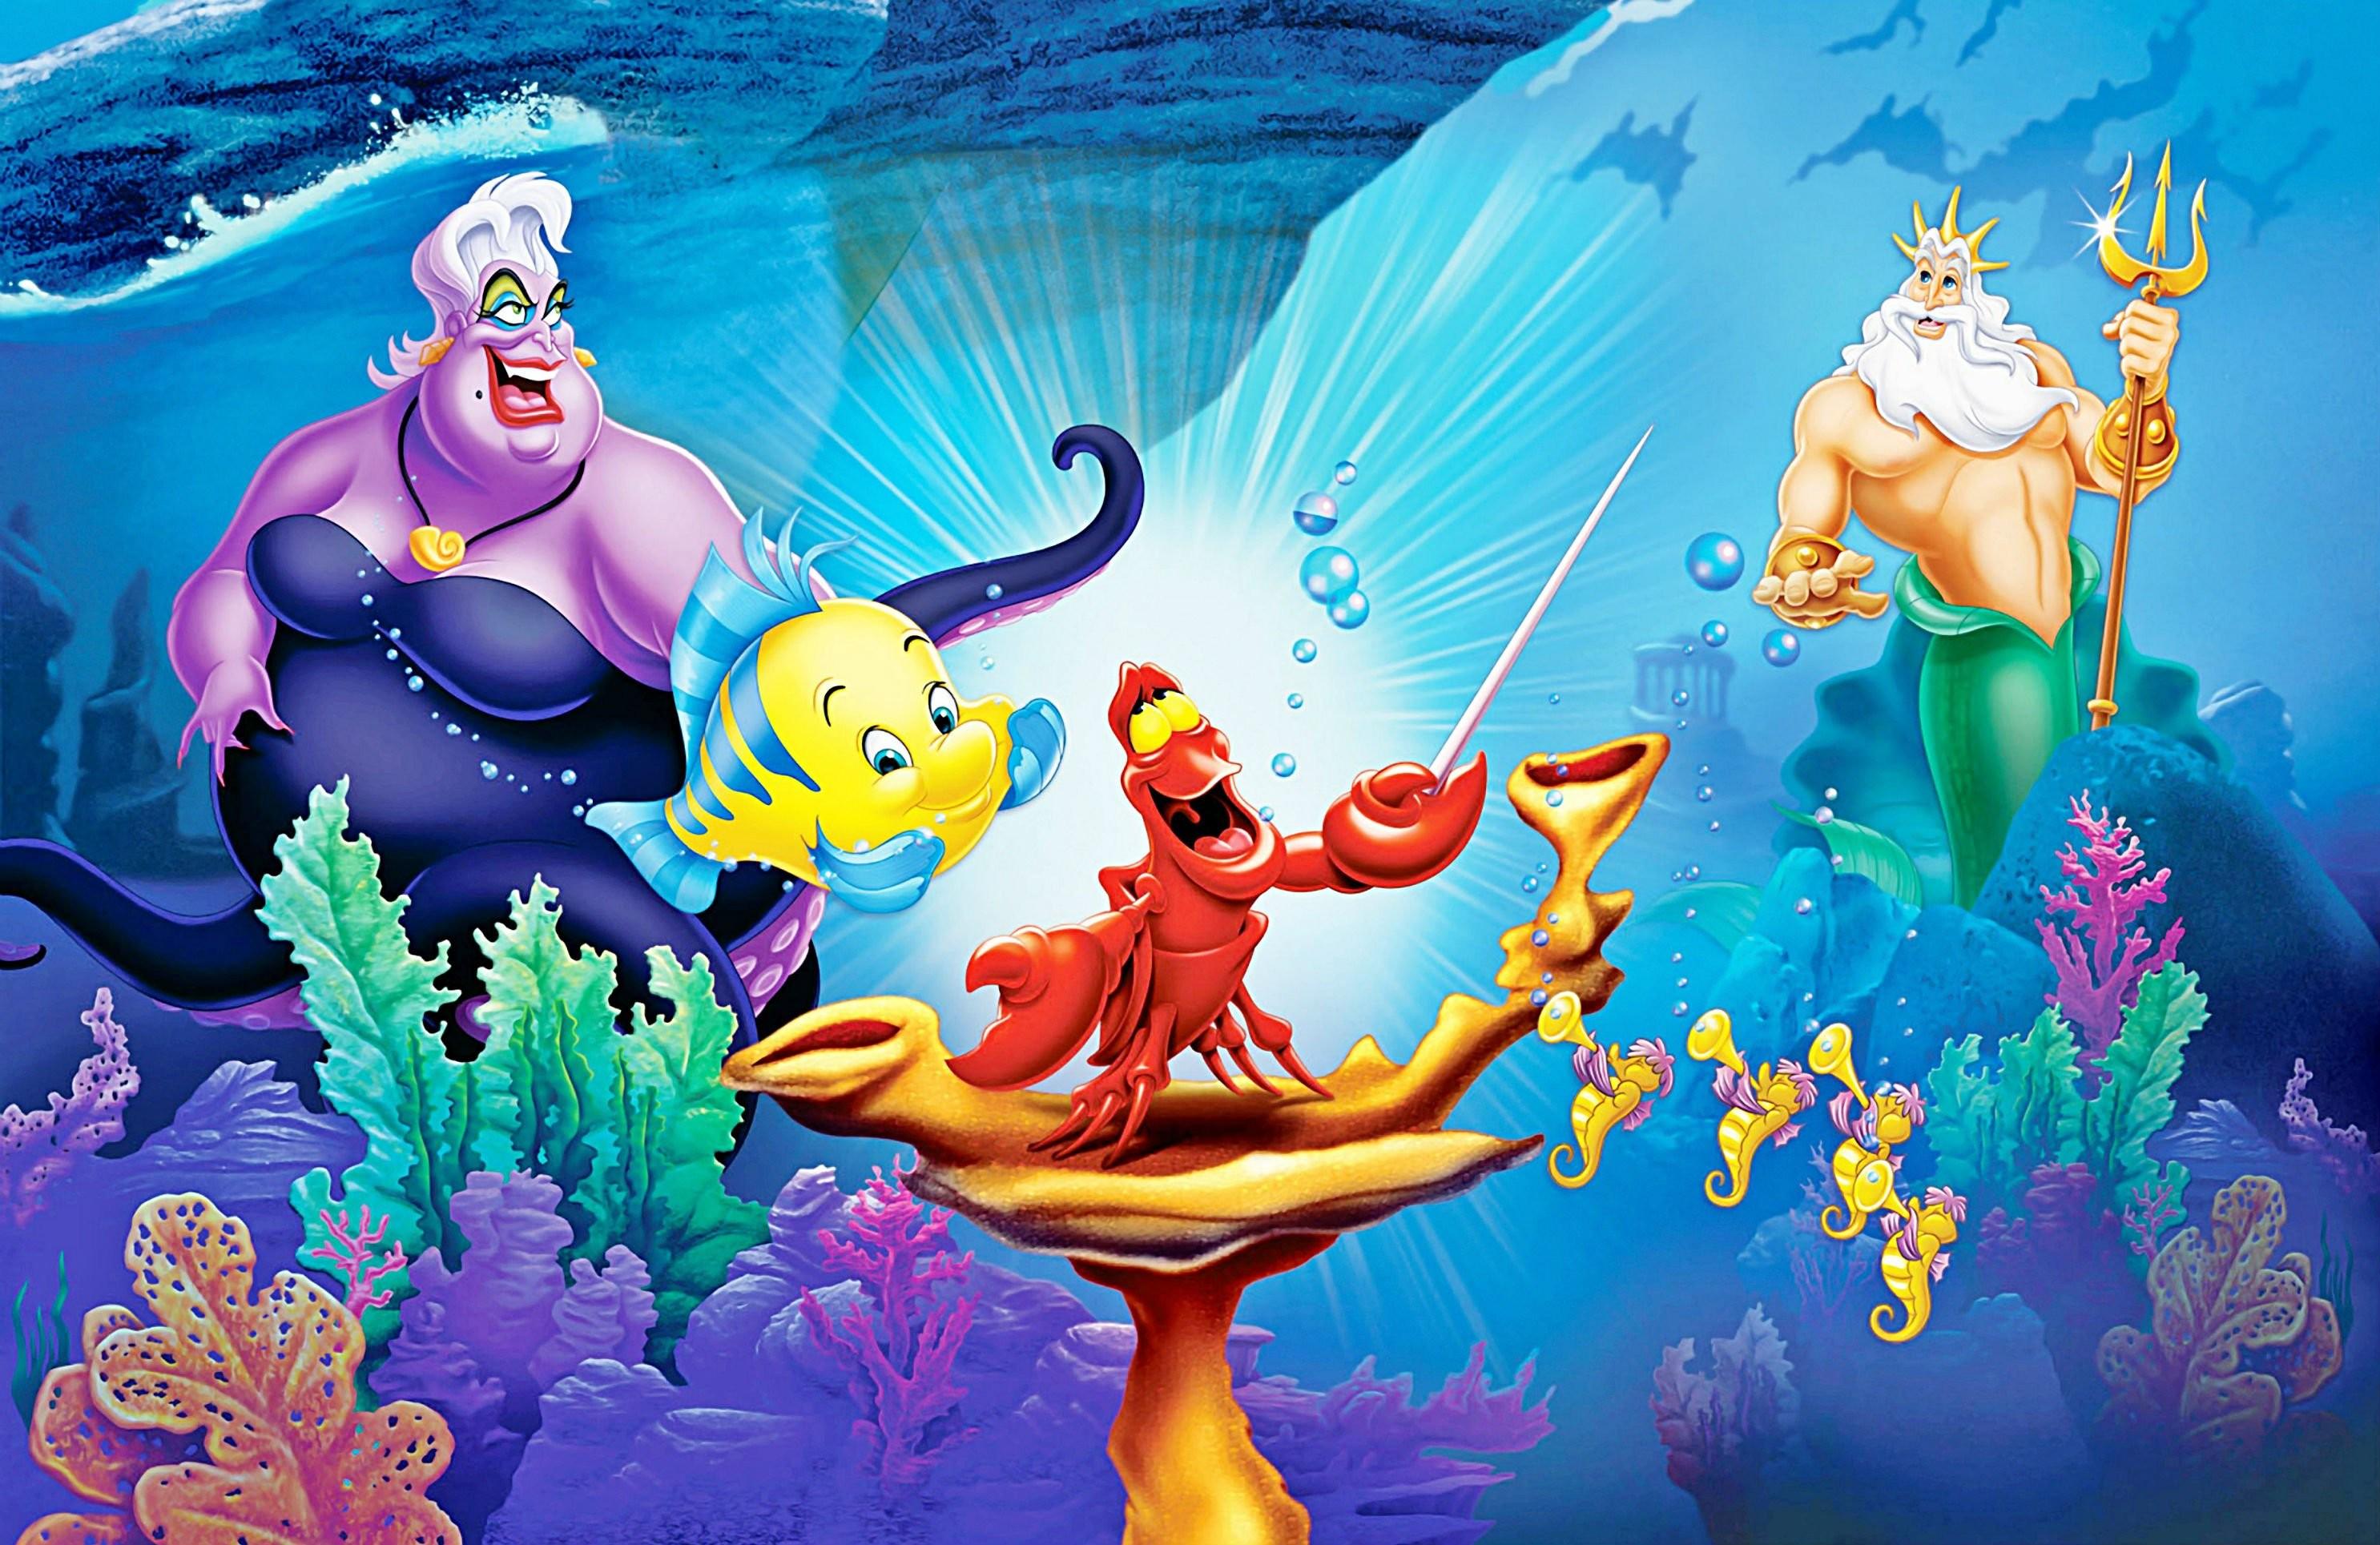 disney-princess-ariel-mermaid-wallpaper-3.jpg (2971×1929) | wallpaper |  Pinterest | Ariel, Funny pictures and Disney minimalist